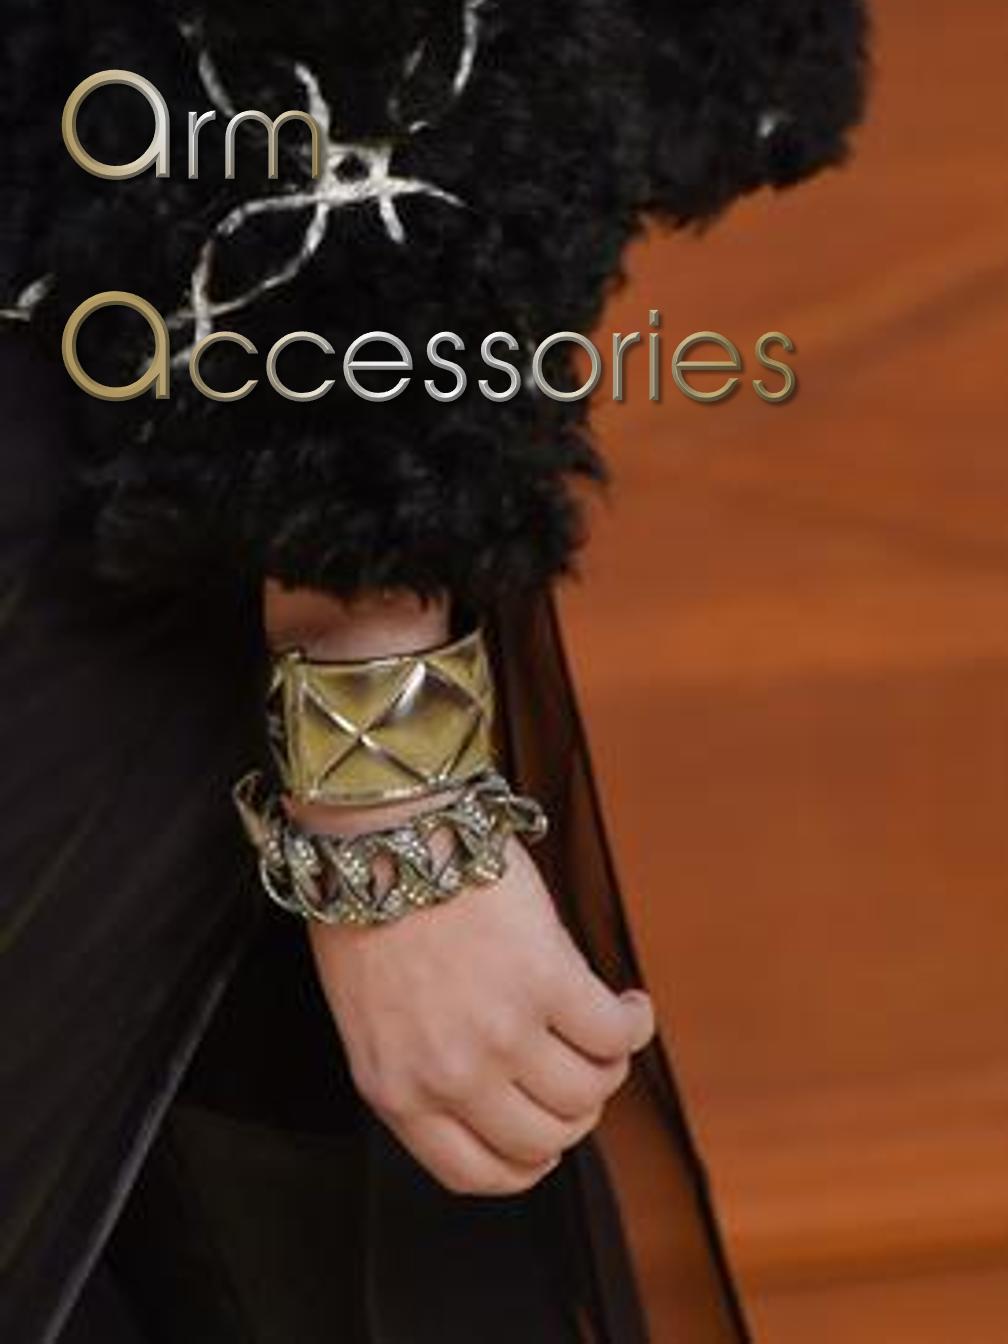 Arm Accessories